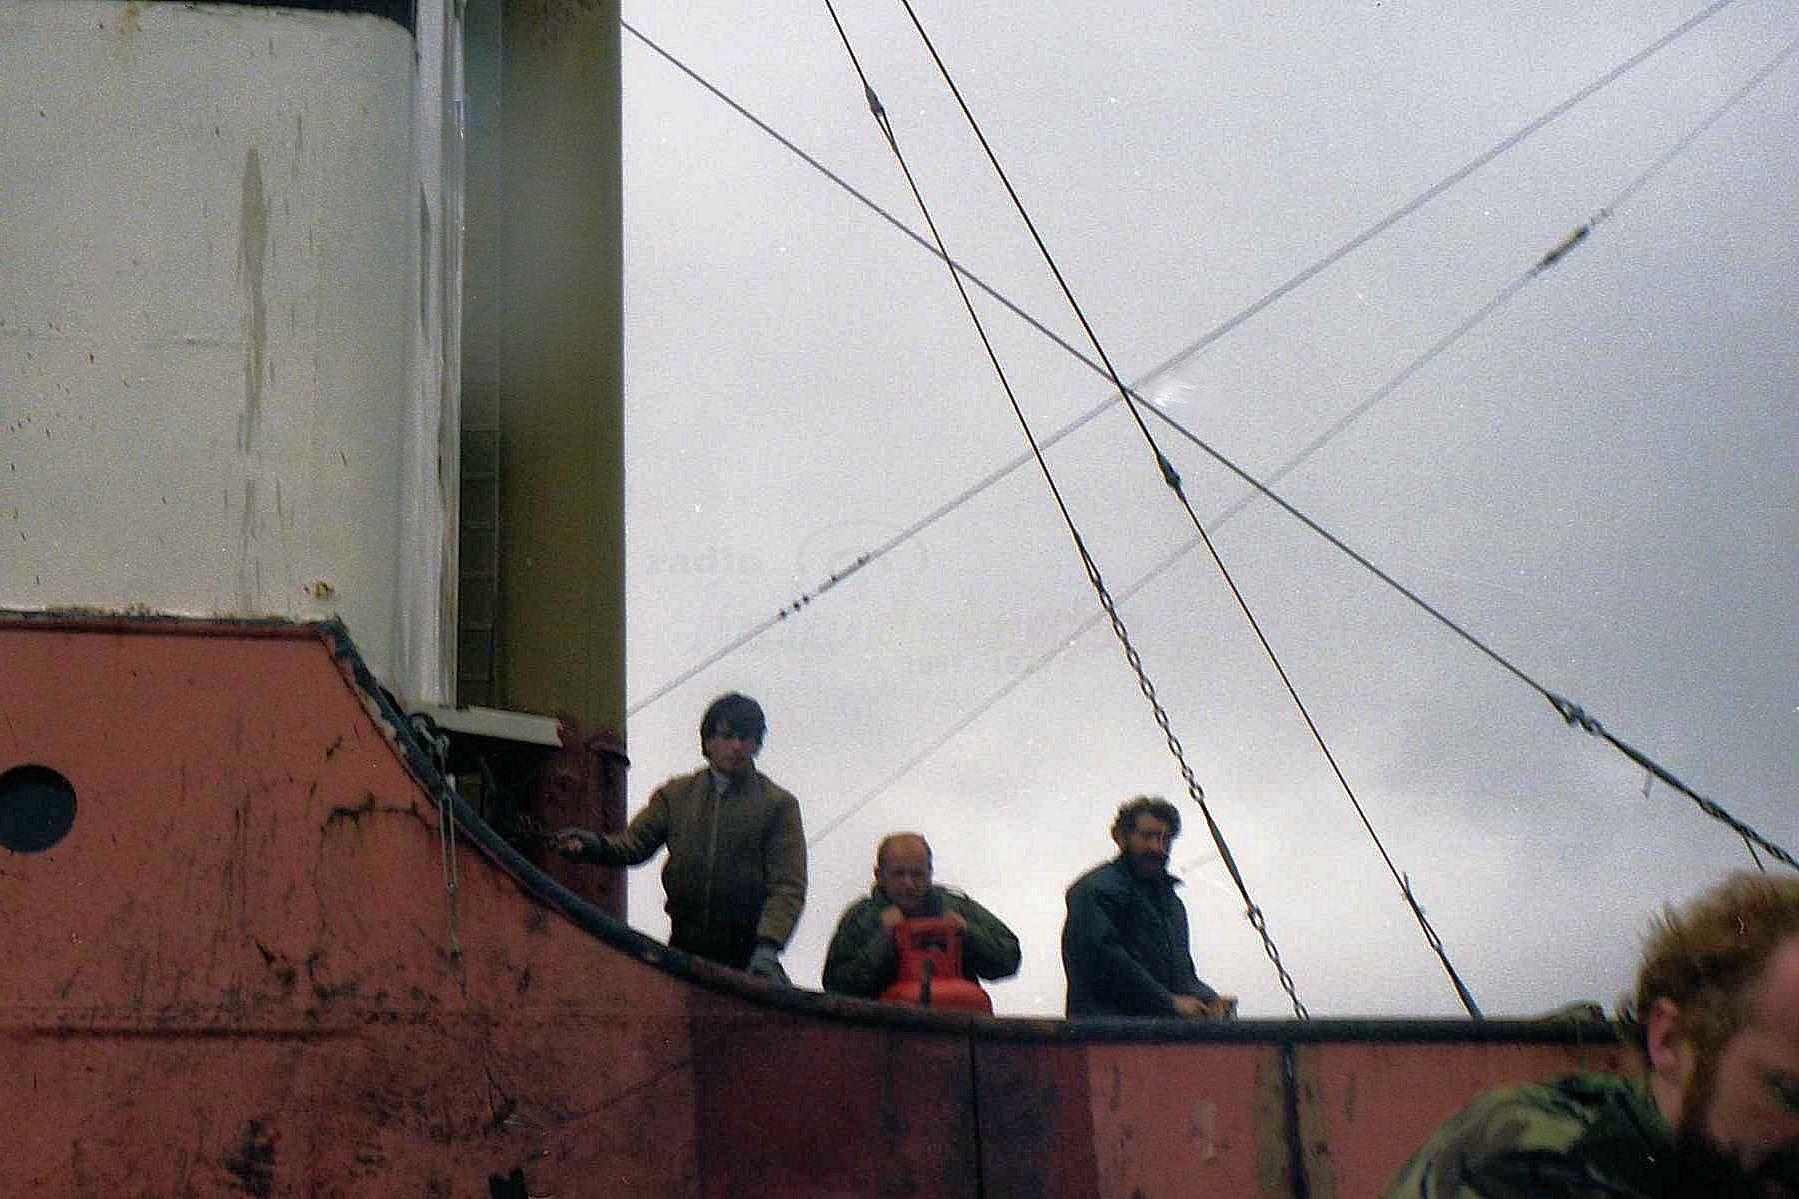 Radio Lazer - The cautious crew manning one of the defense system - 1984 (Courtesy John Payne)